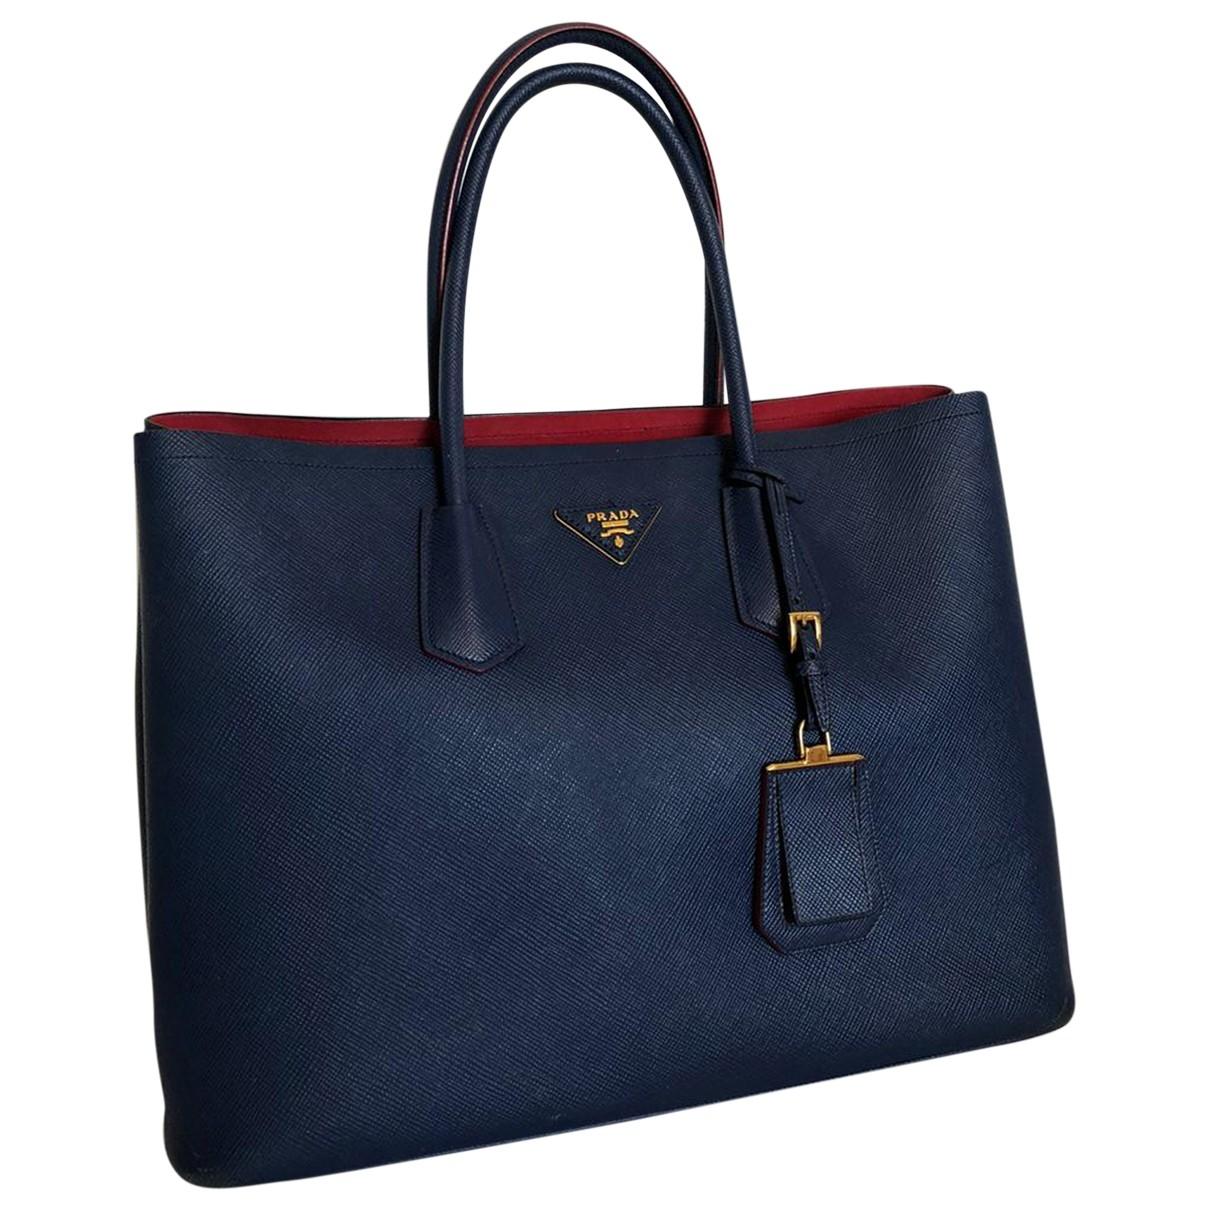 Prada Bibliothèque Blue Leather handbag for Women \N